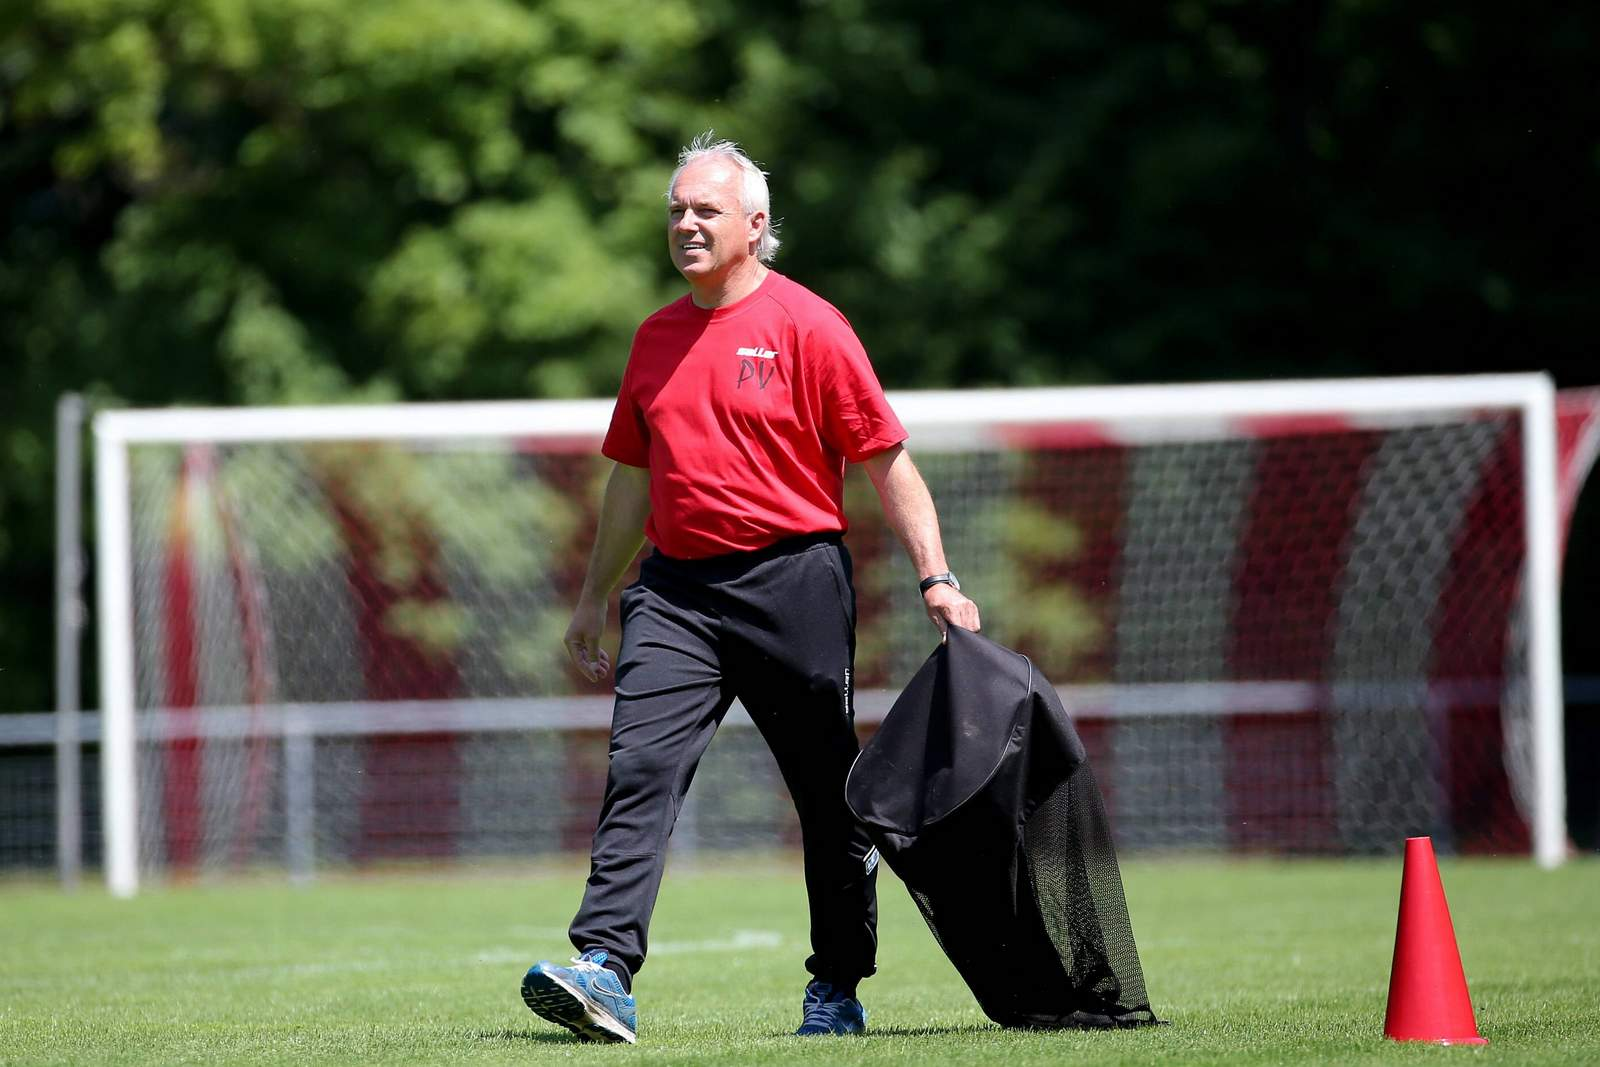 Bekommt keinen neuen Vertrag: Aalen Trainer Peter Vollmann